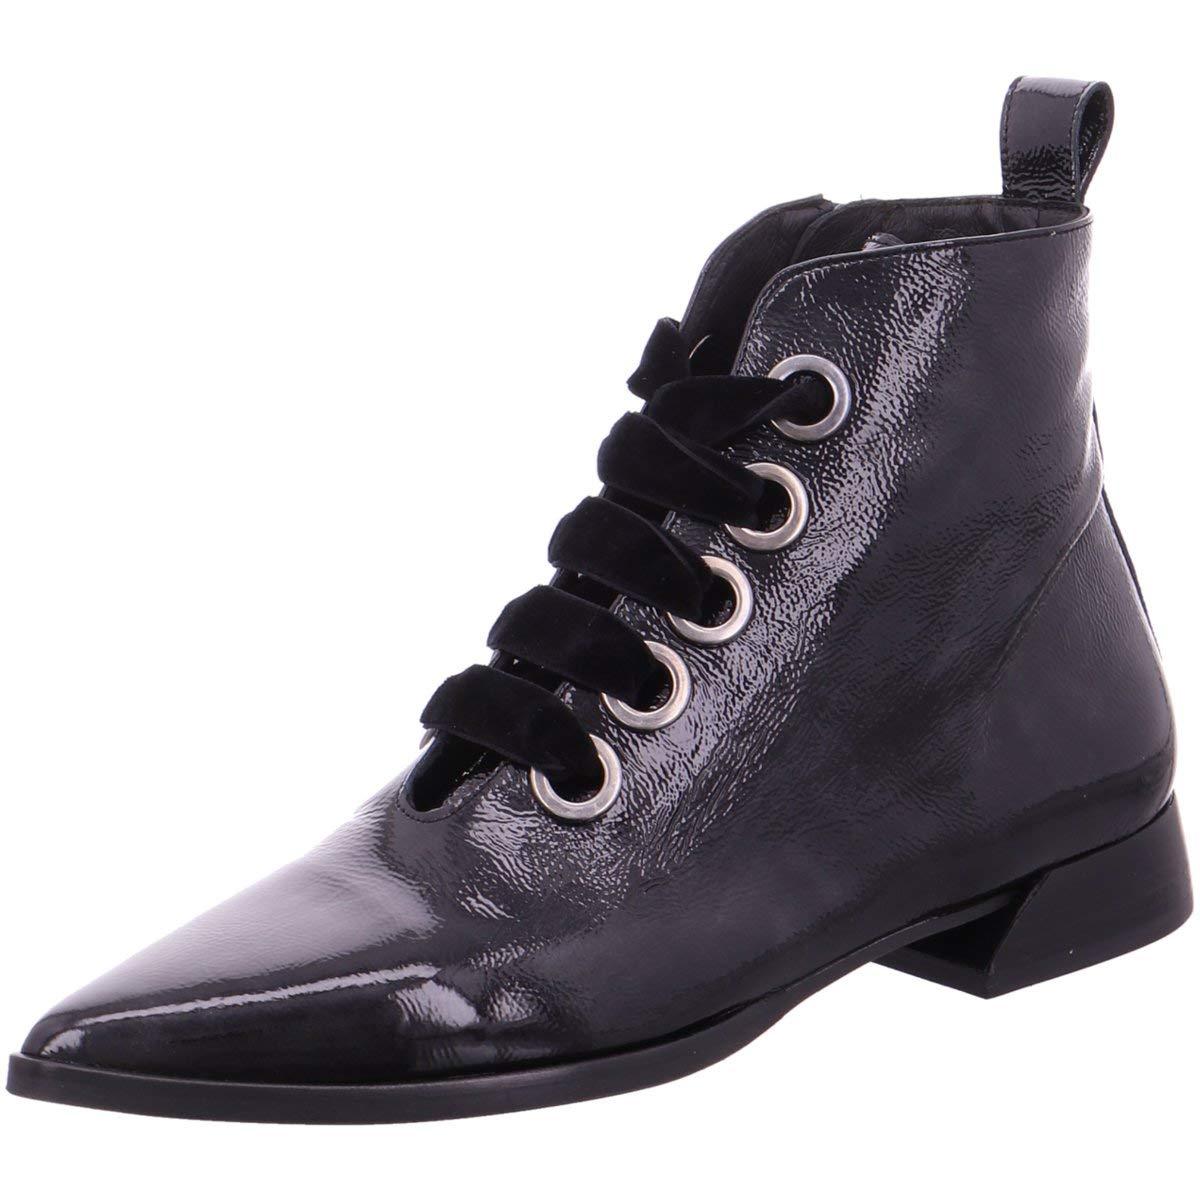 Zinda Damen Stiefeletten 3738 schwarz schwarz schwarz 526330 aa5689